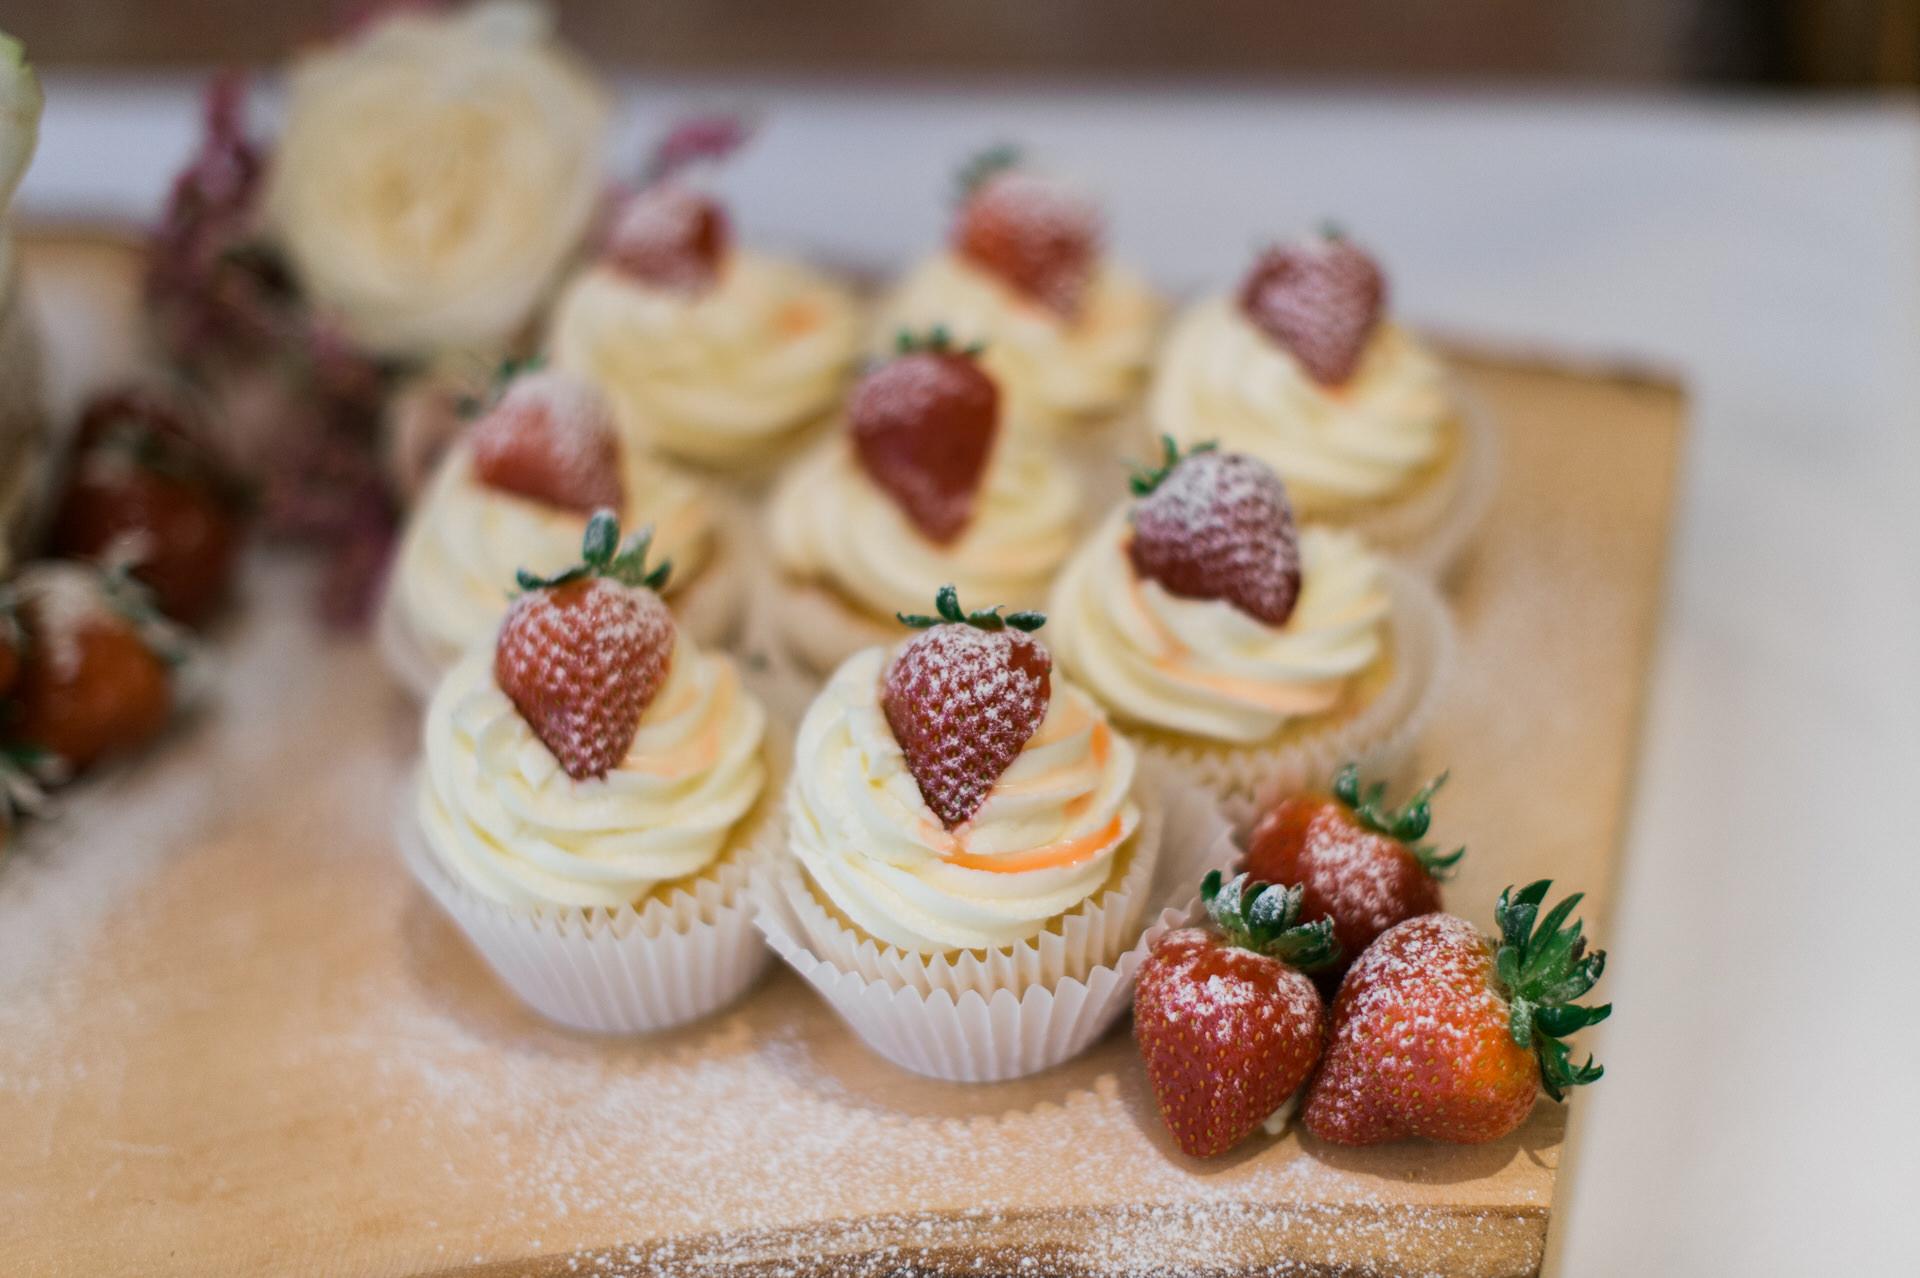 Charlton House wedding cake